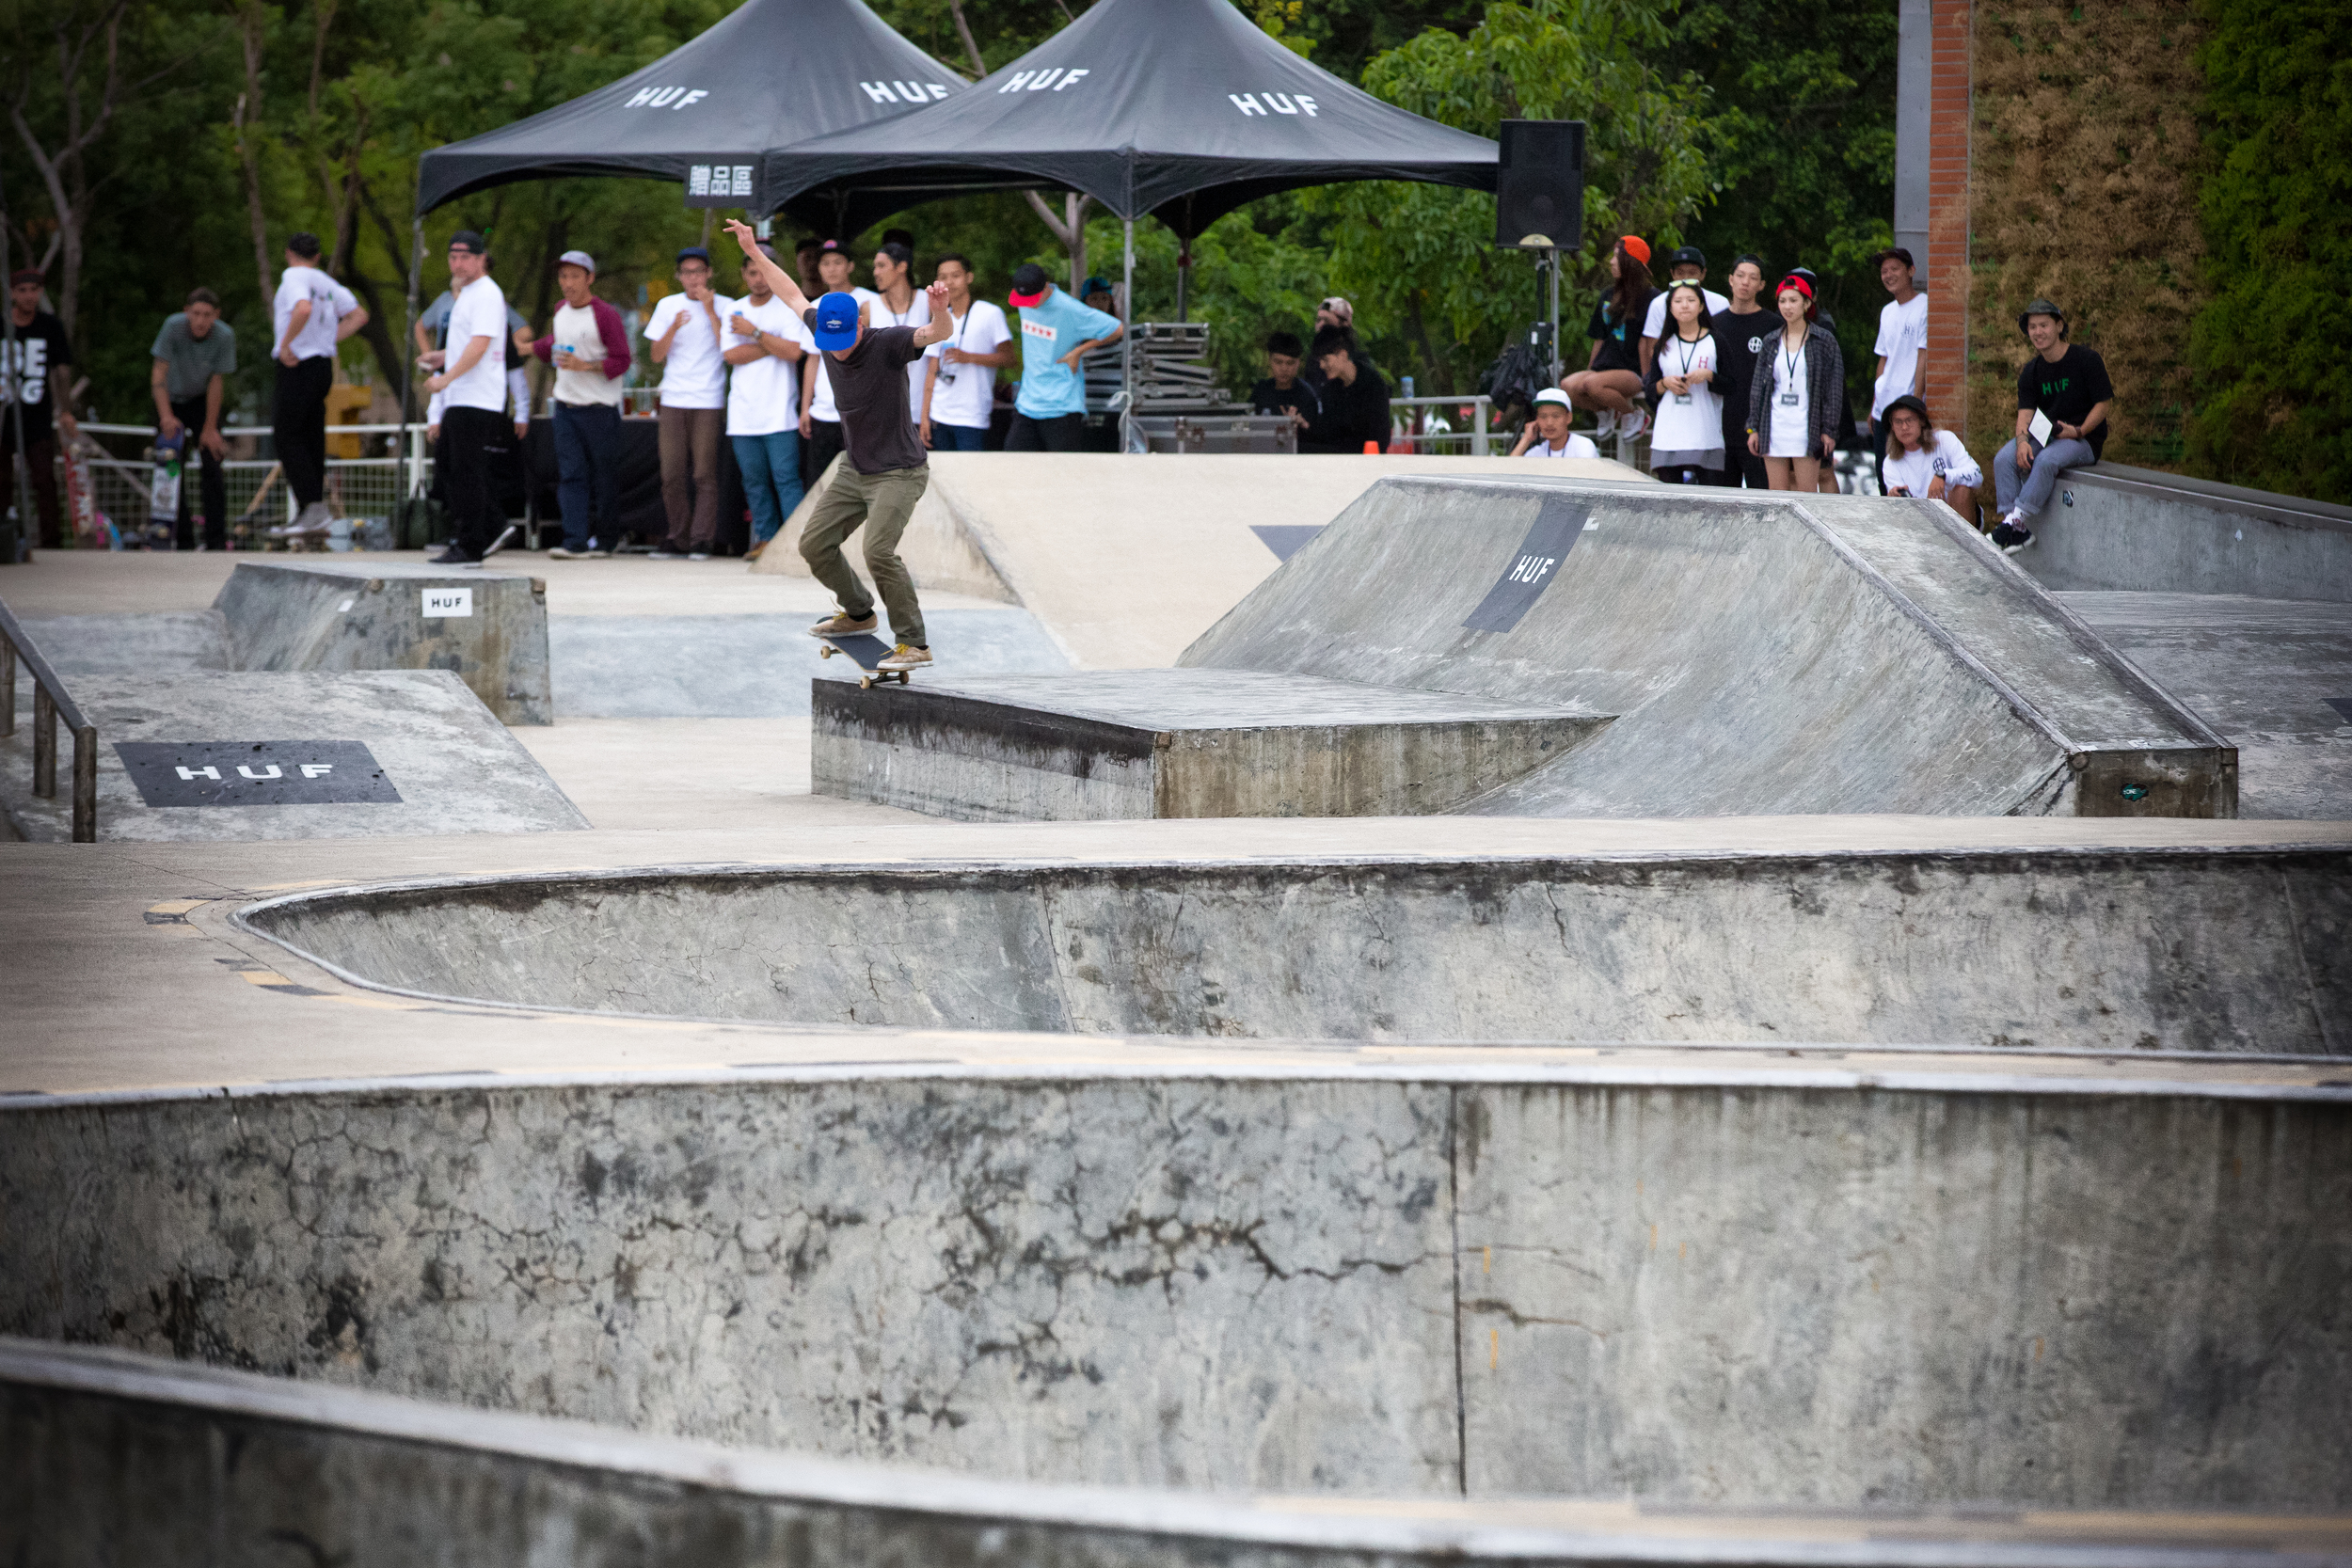 HUF team member Brad Cromer sampling some of the facilities at the Hsin-Shih skatepark.